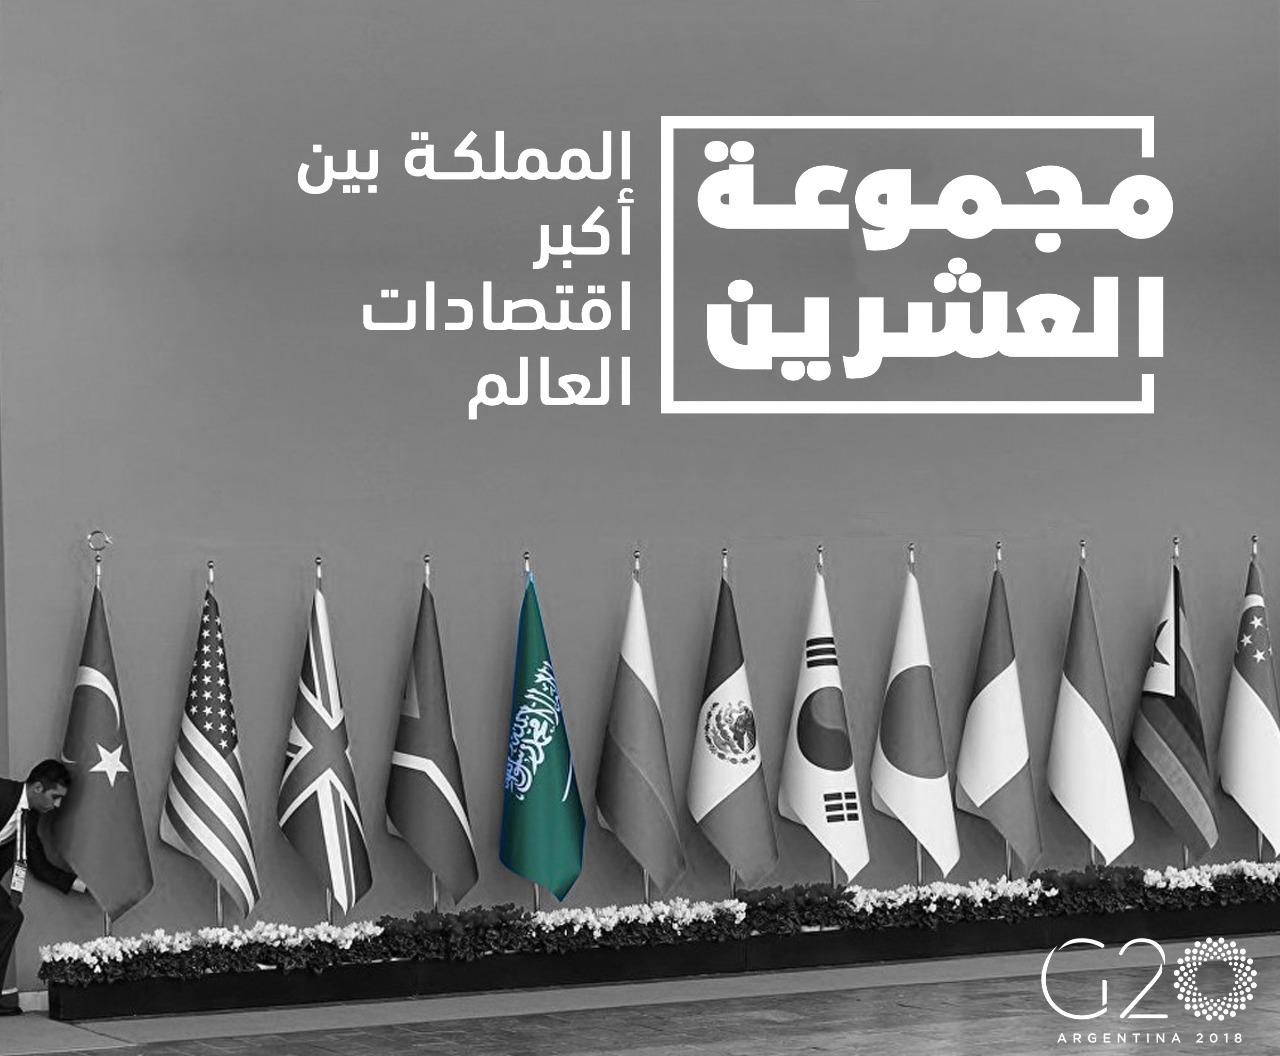 بالفيديو والصور متابعات قمة G20  #CrownPrinceInG20